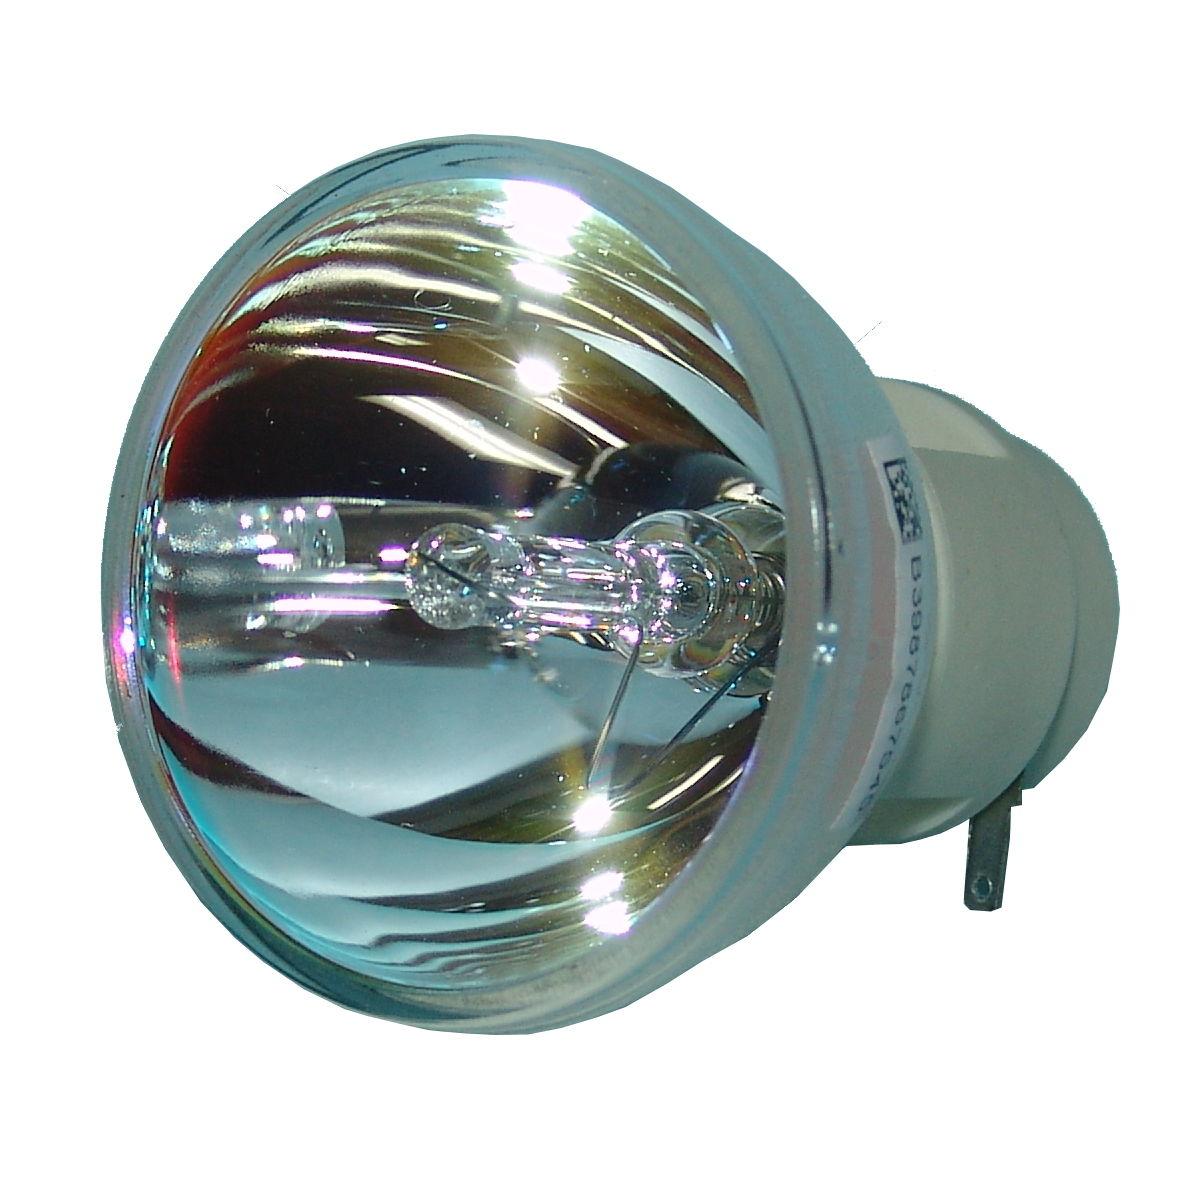 Compatble Bare Bulb P-VIP 220/1.0 E20.8 5811116713-SU for Vivitek D853W D851 D855ST D857WT D858WTPB D856STPB Projector Lamp Bulb original projector lamp 5811116713 su repla2000cement lamp for vivitek d853w d855st d856stpb d857wt d858wtpb d850 d856st projectors